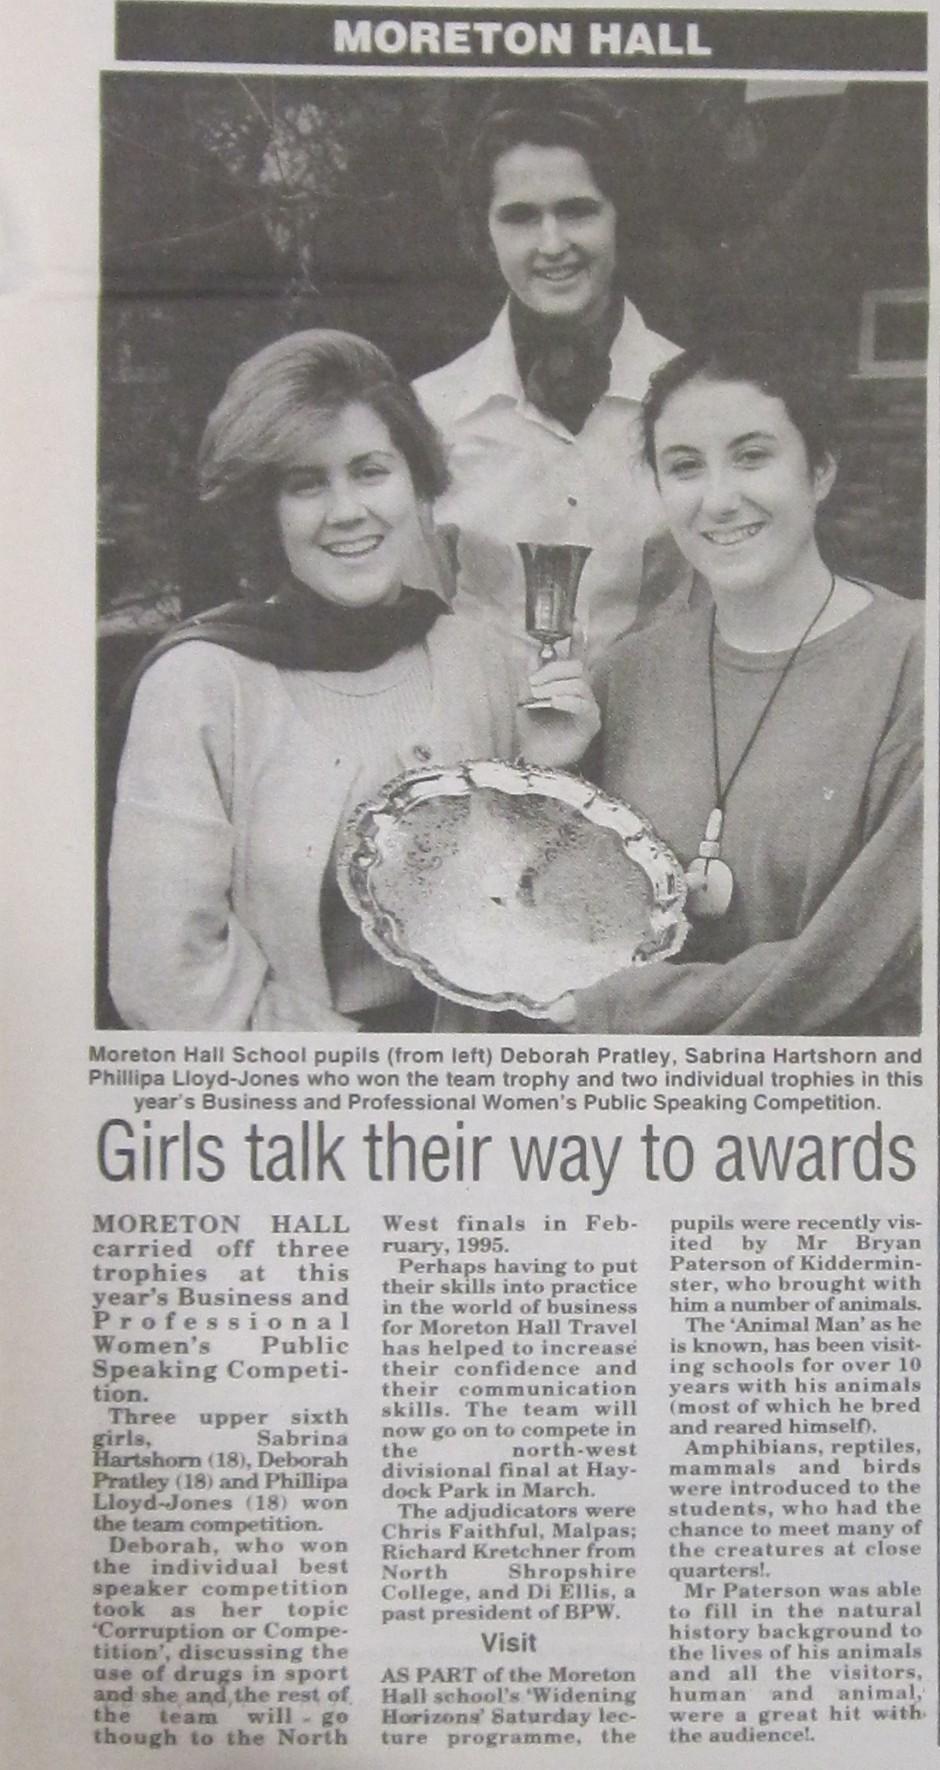 NM-M-29-10 - Moreton Hall Girls in Public Speaking Comp - 1997